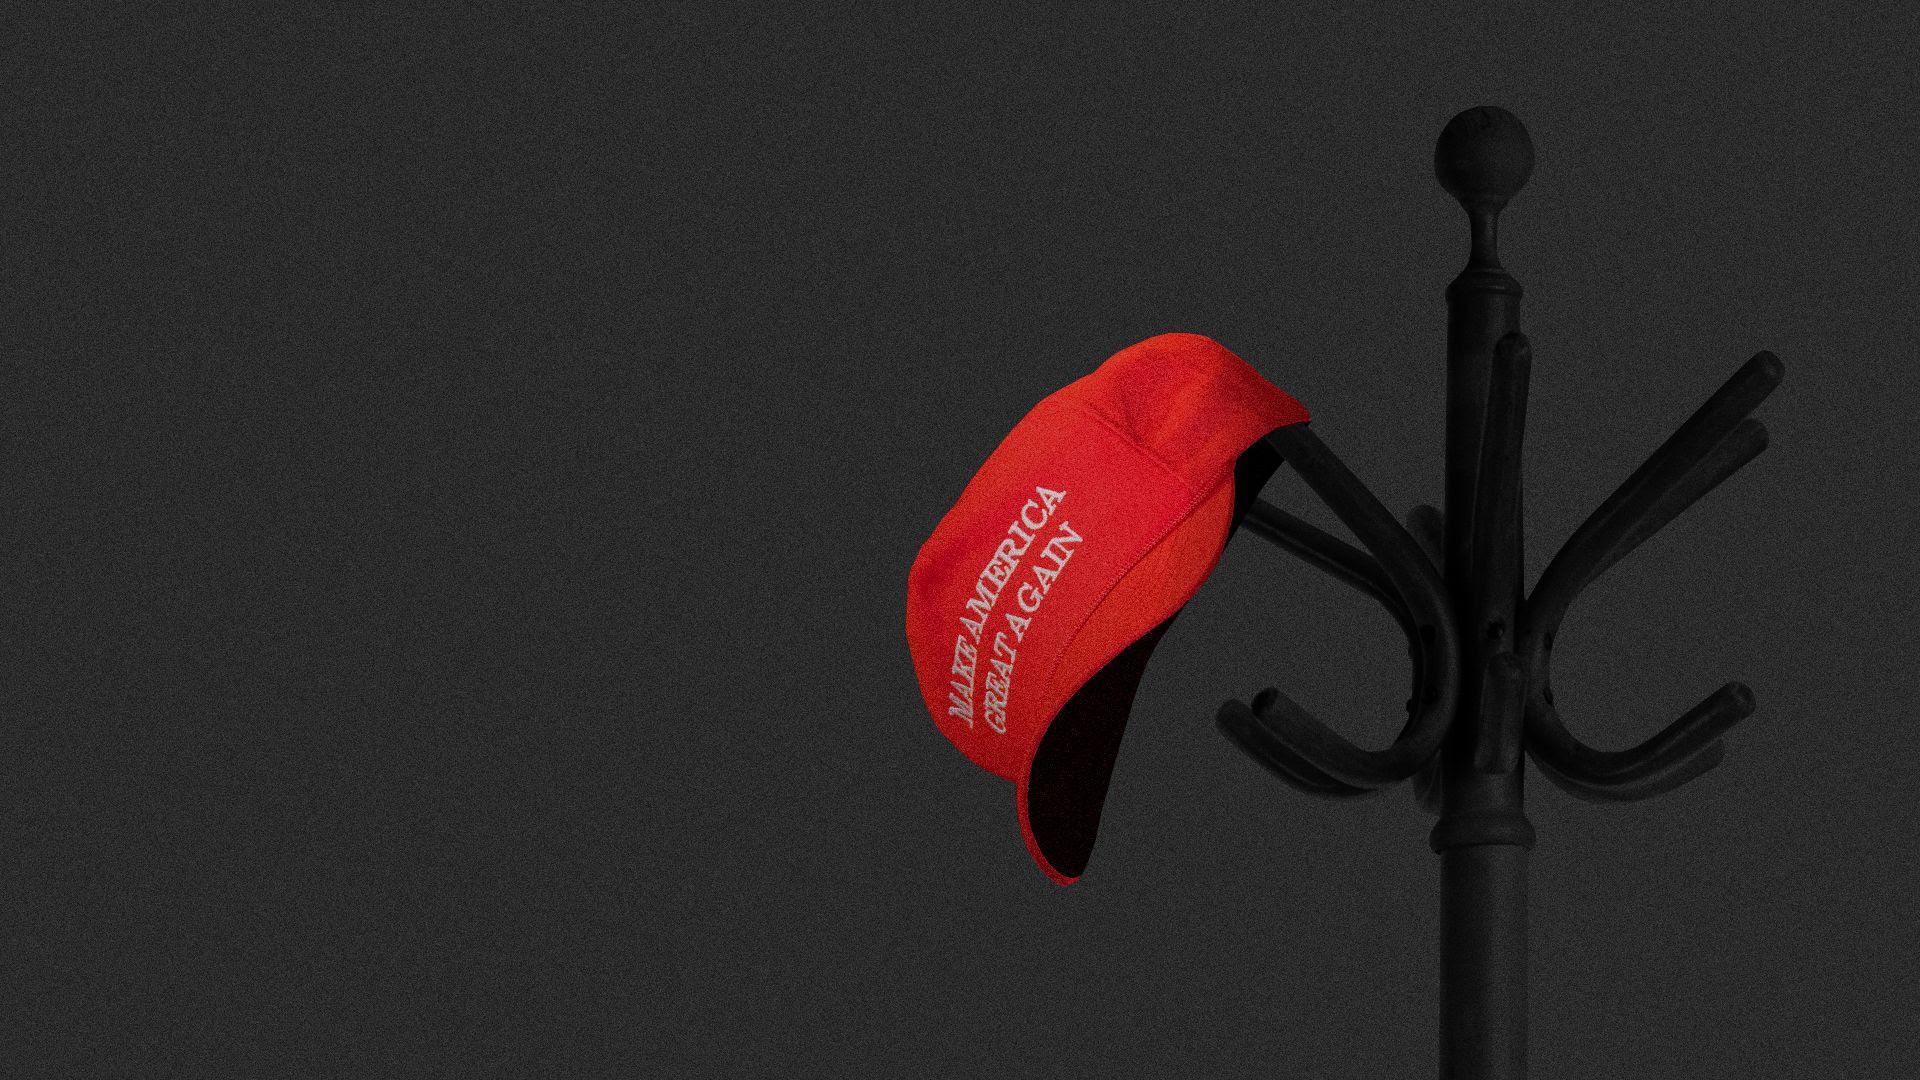 Illustration of MAGA hat hung up on coat rack